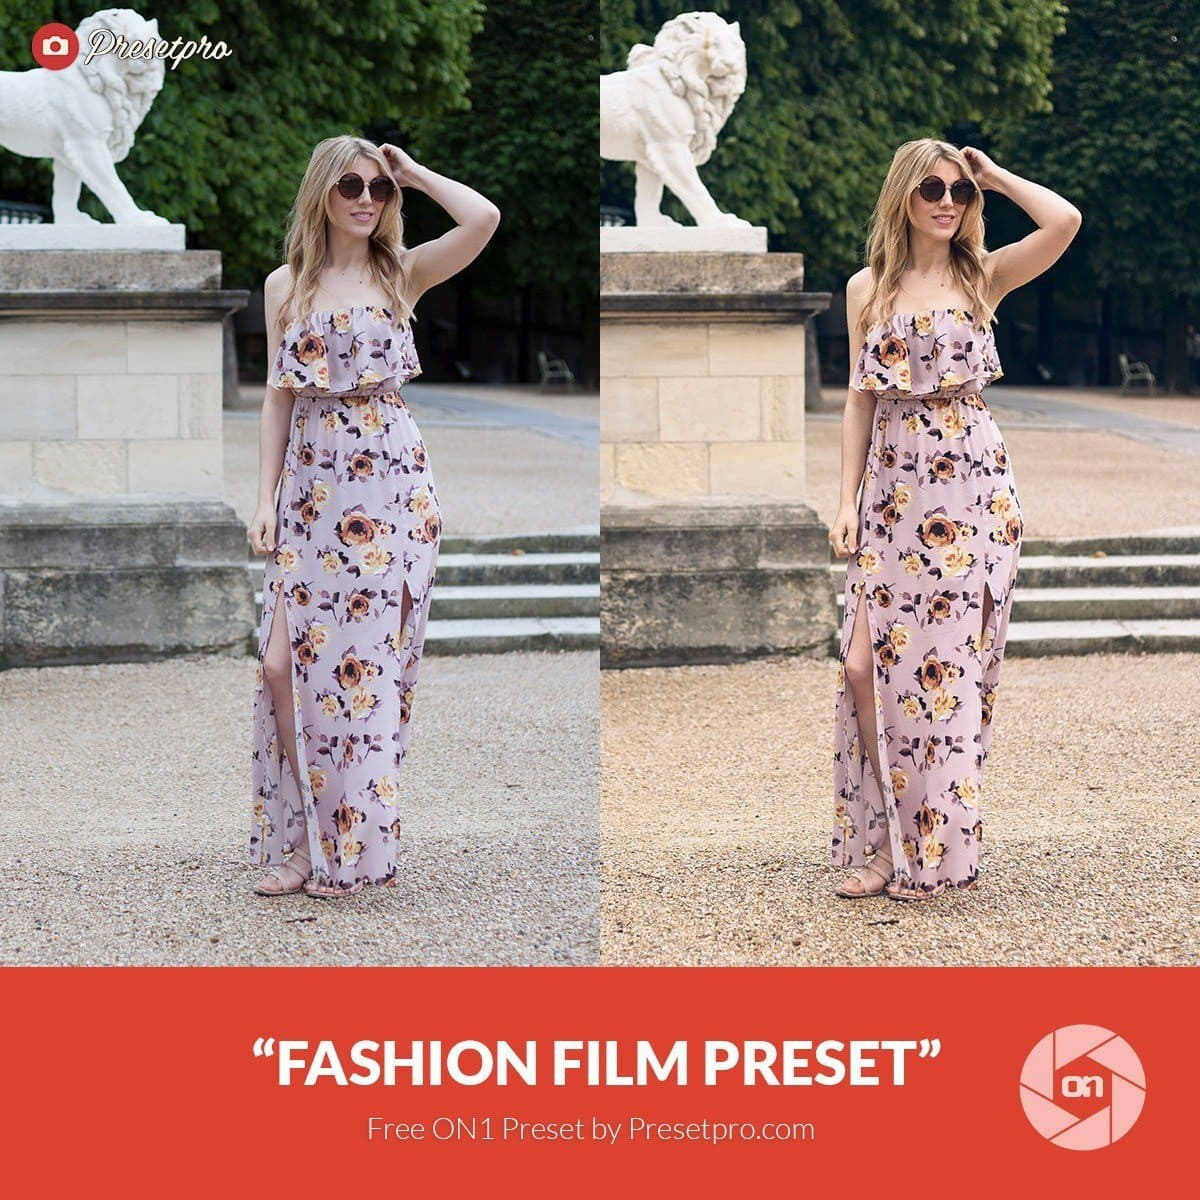 Free-On1-Preset-Fashion-Film-Presetpro.com